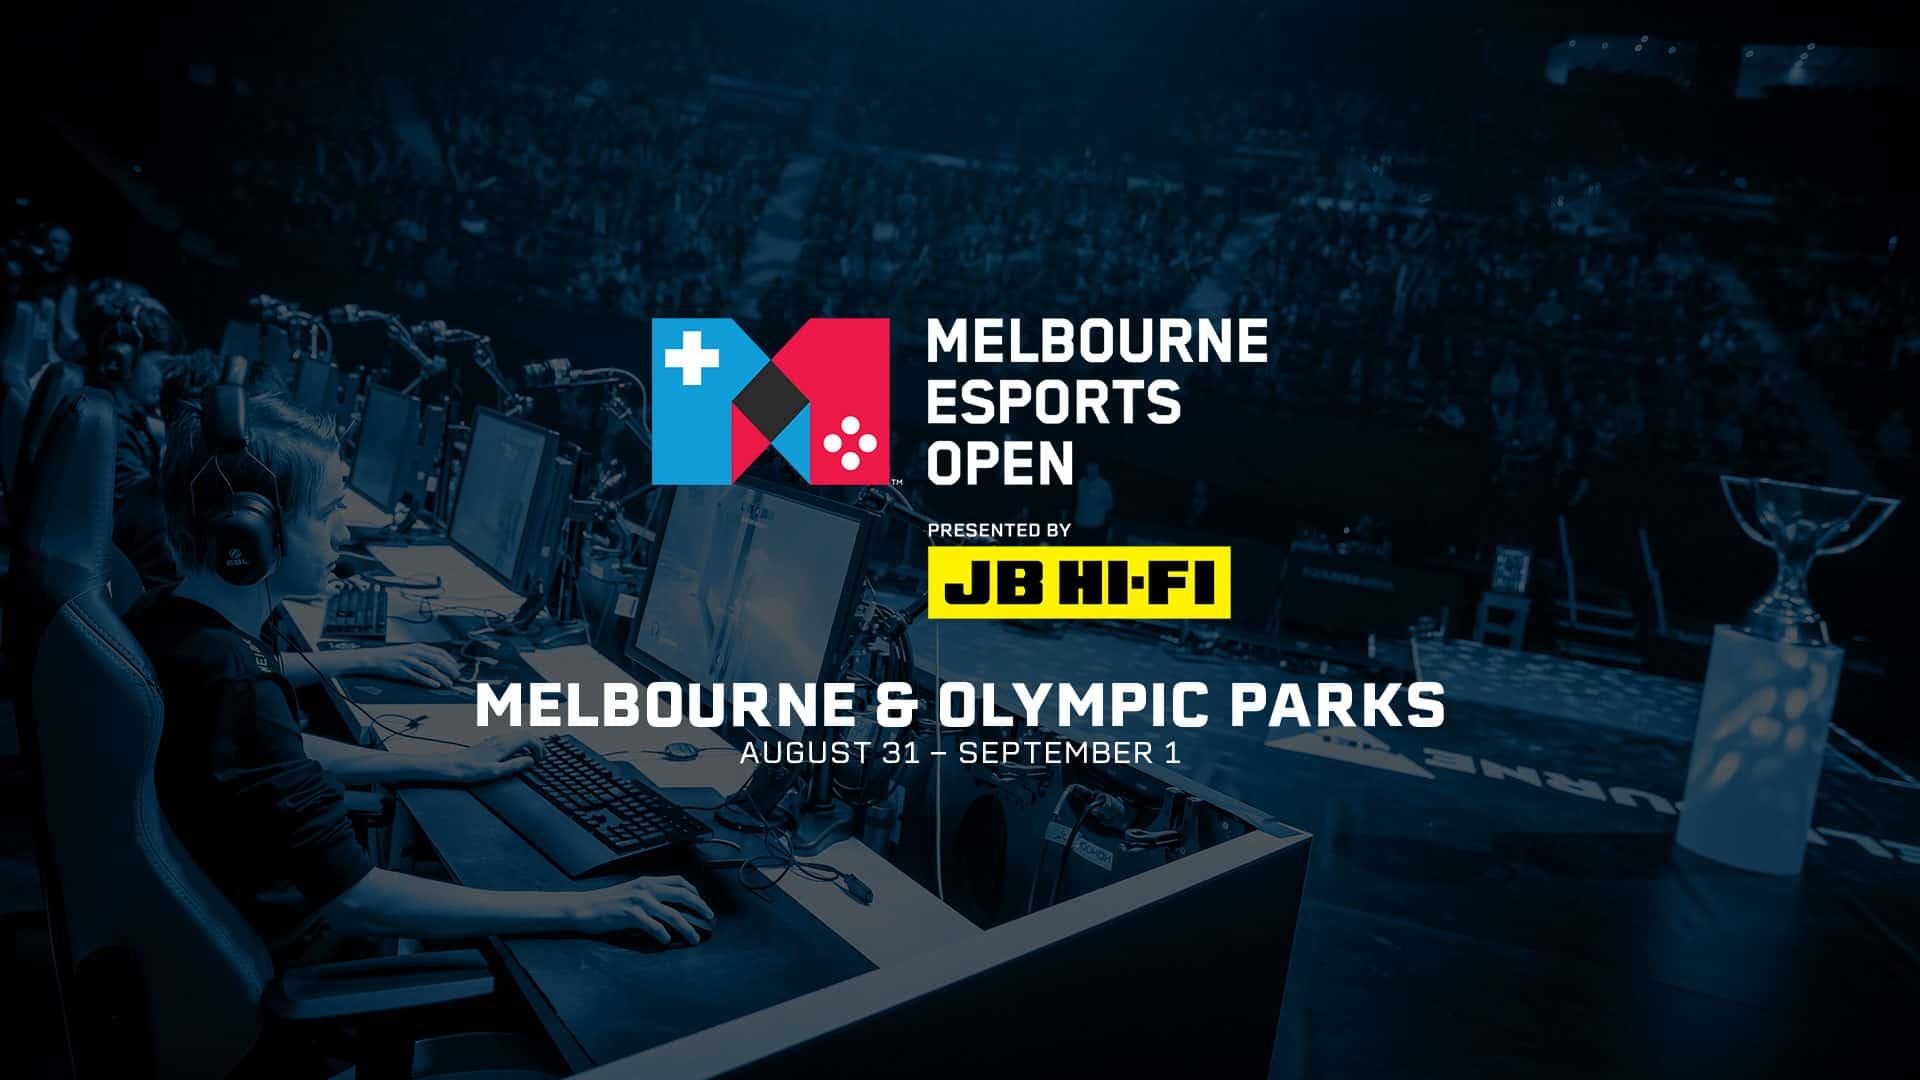 Global Gaming Phenomenon Fortnite Returns To The Melbourne Esports Open